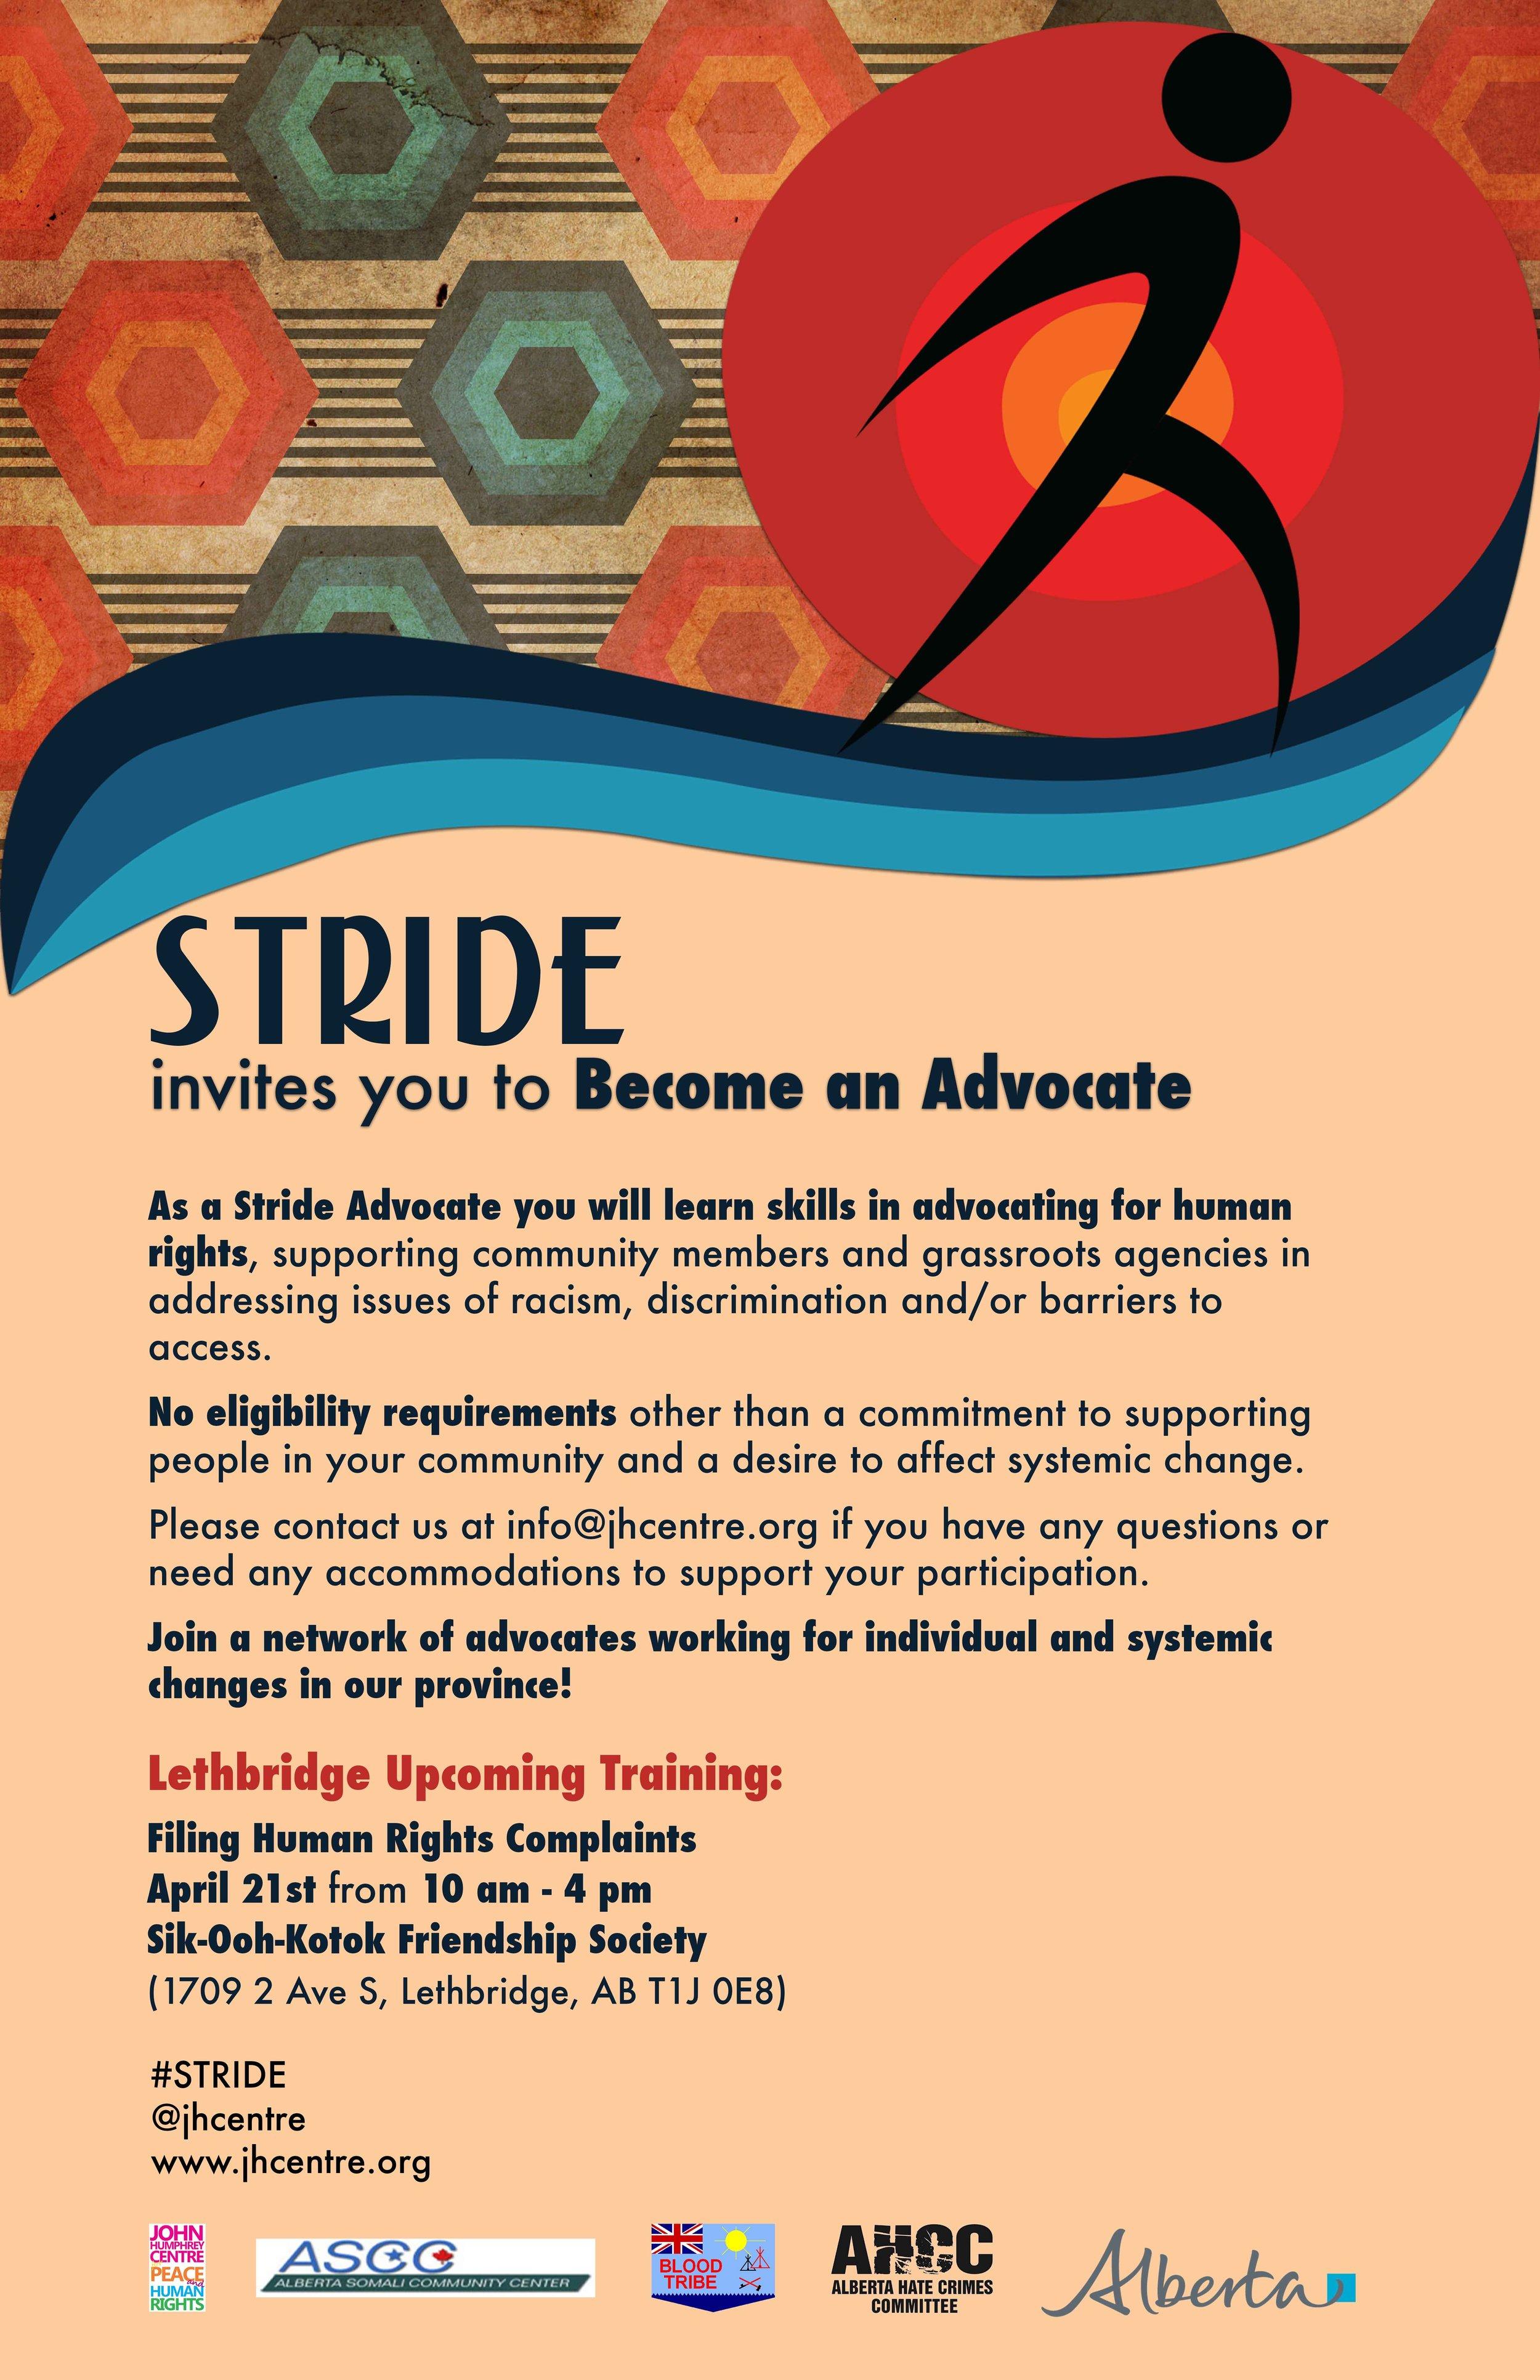 StrideAdvocate-Lethbridge-April21-low.jpg